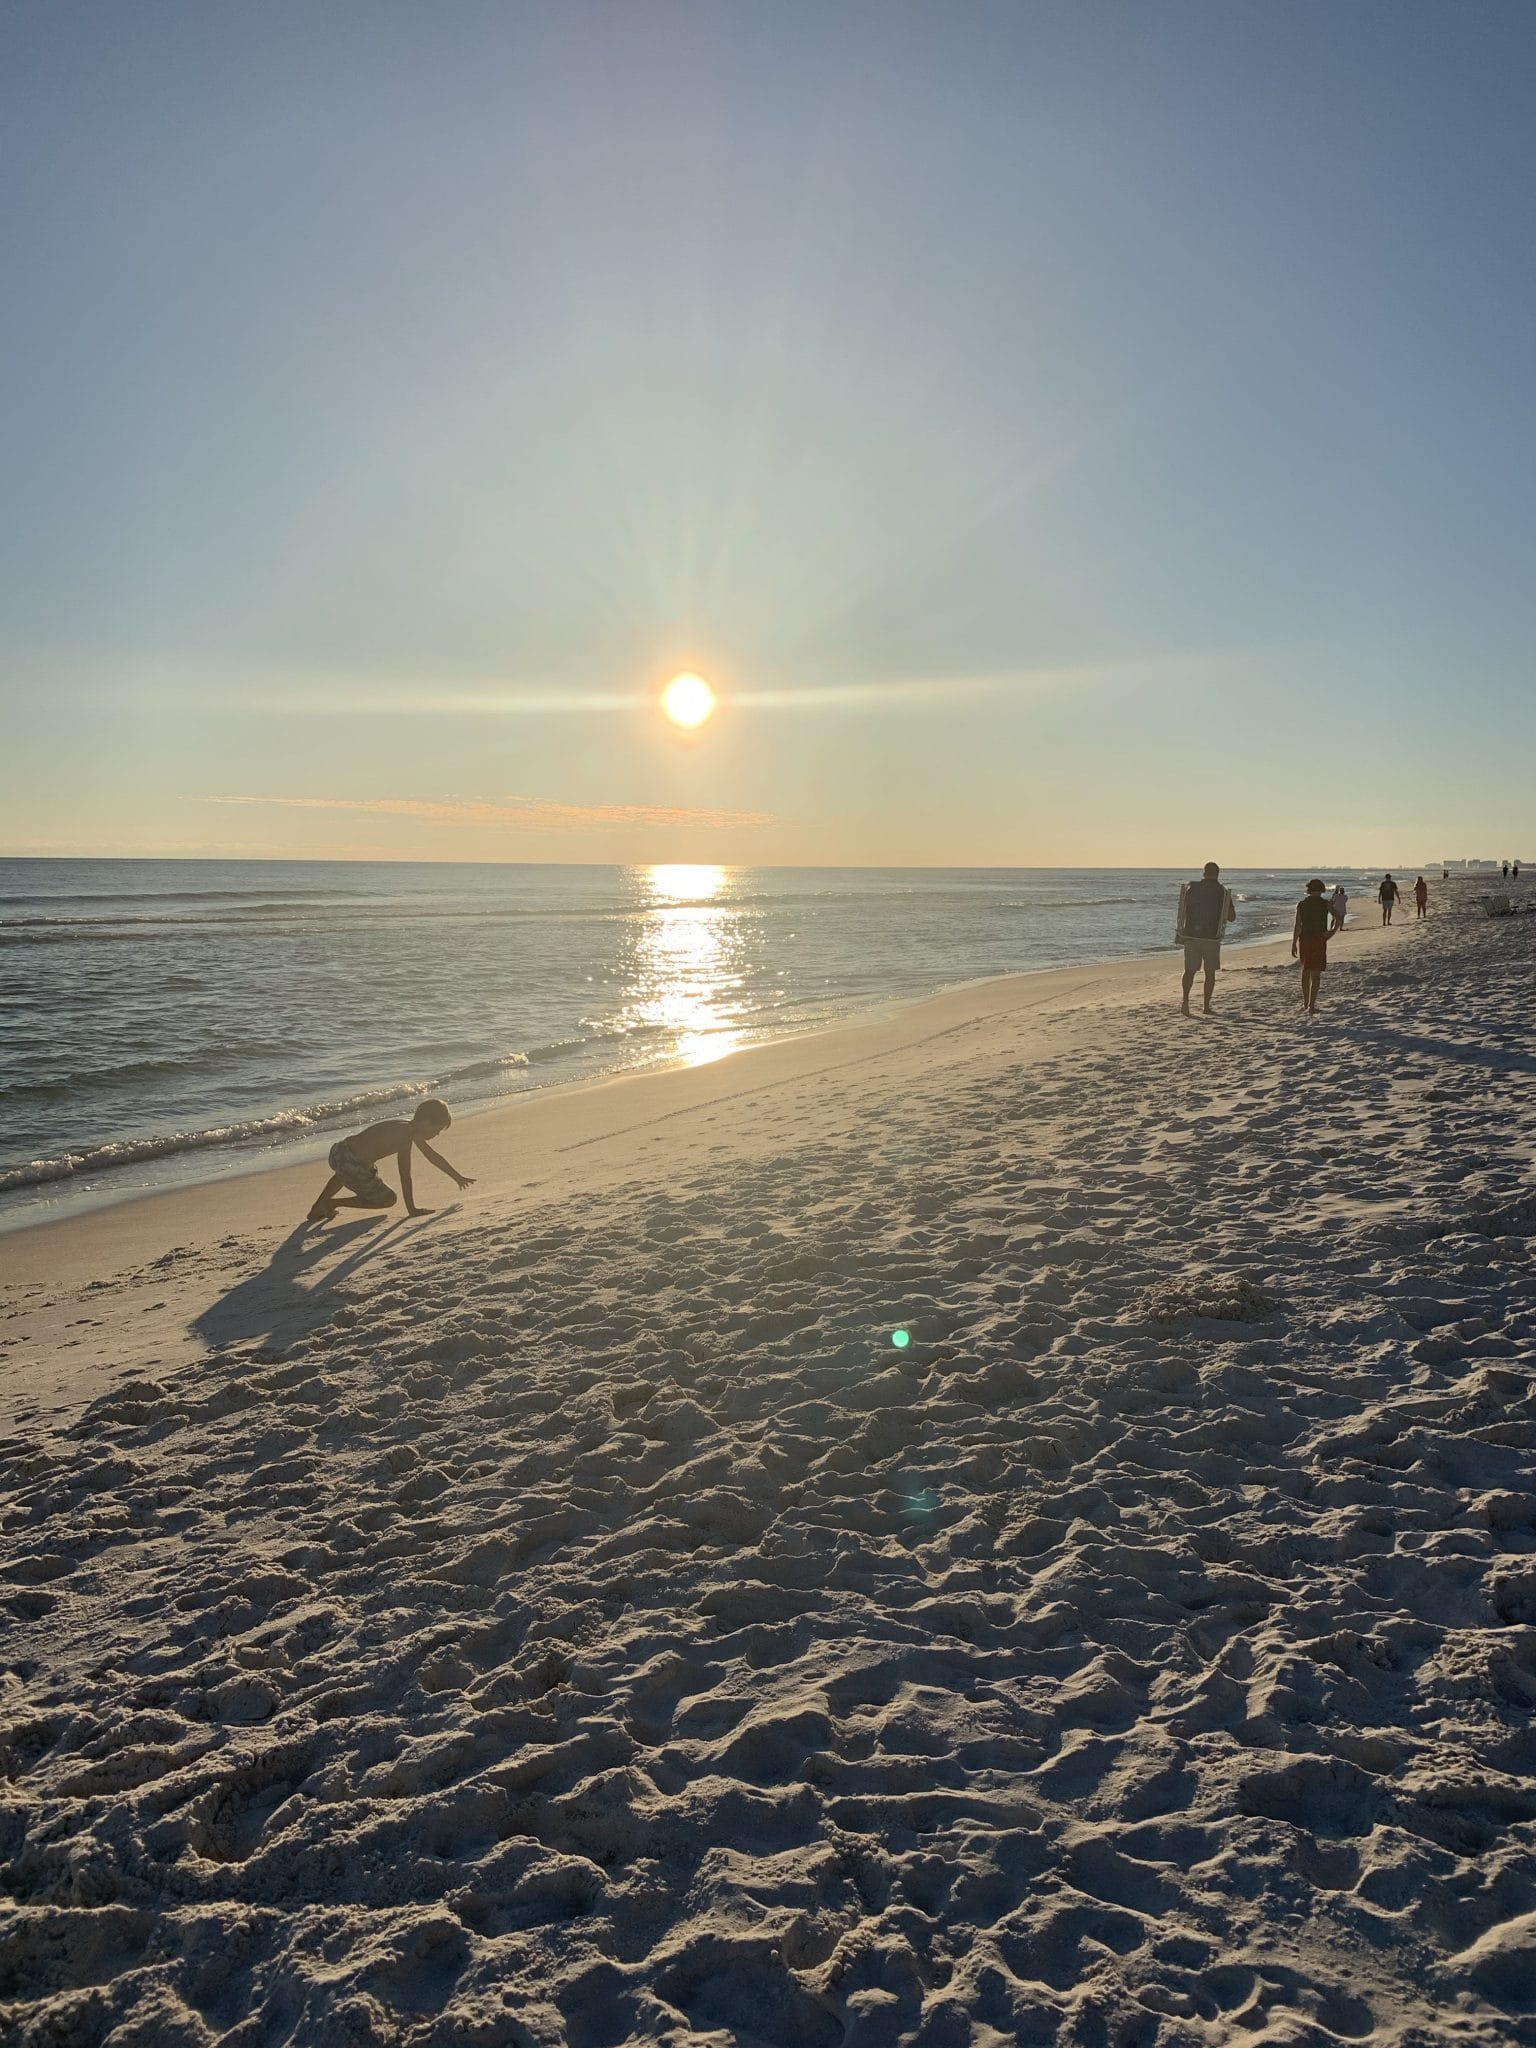 30A, Destin, Florida vacation 2021, Stilettos and Diapers